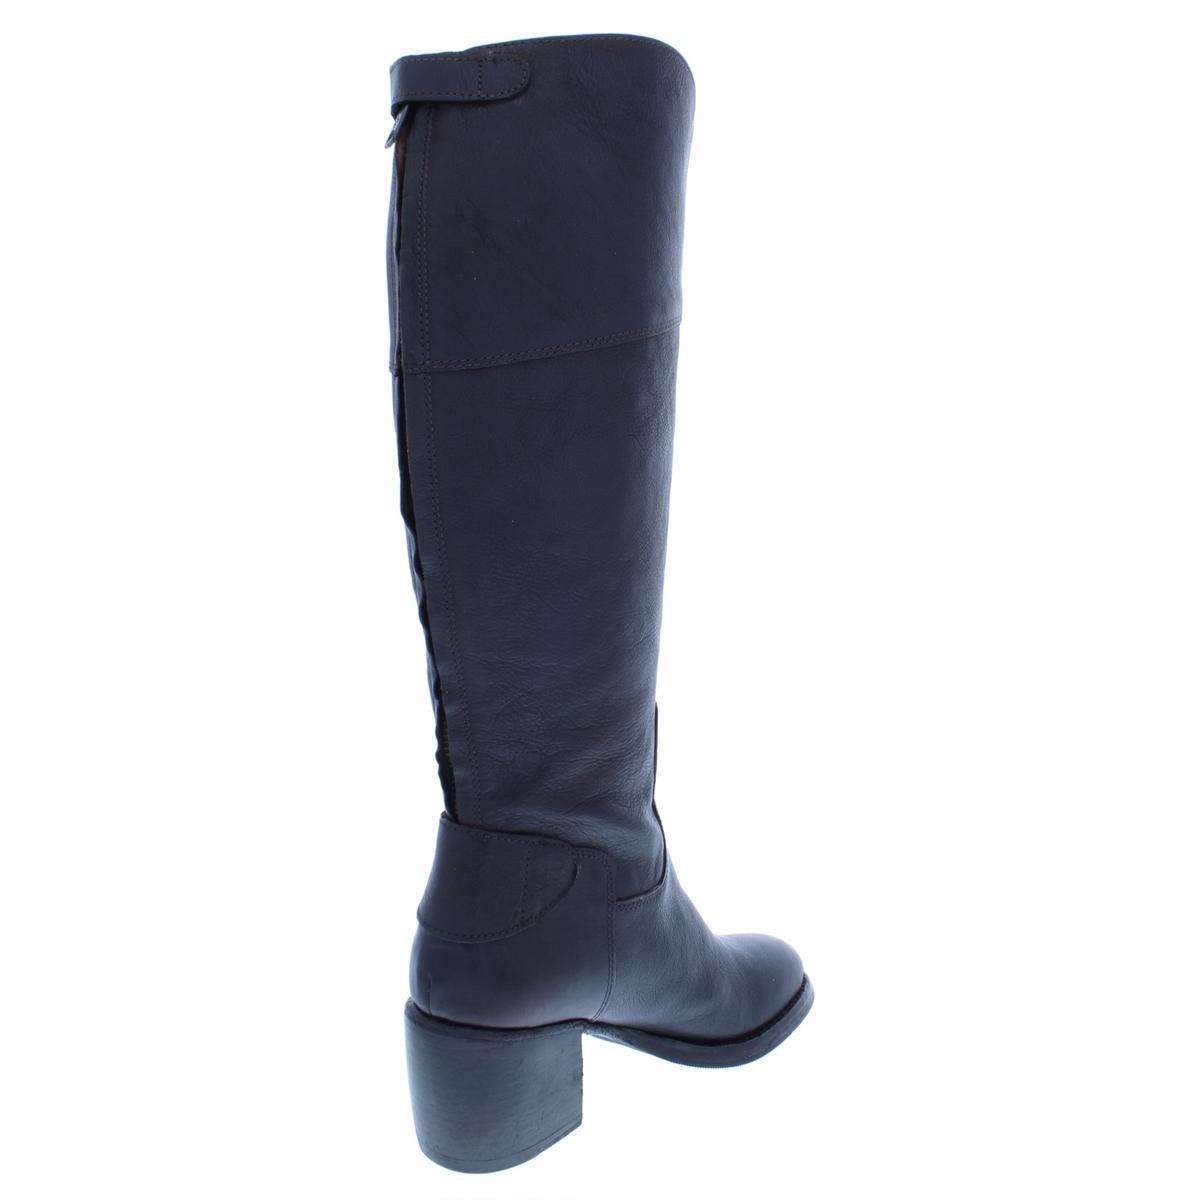 Patricia Nash damen Loretta Wide Calf Calf Calf Leather Riding Stiefel Heels BHFO 5507 774c0b